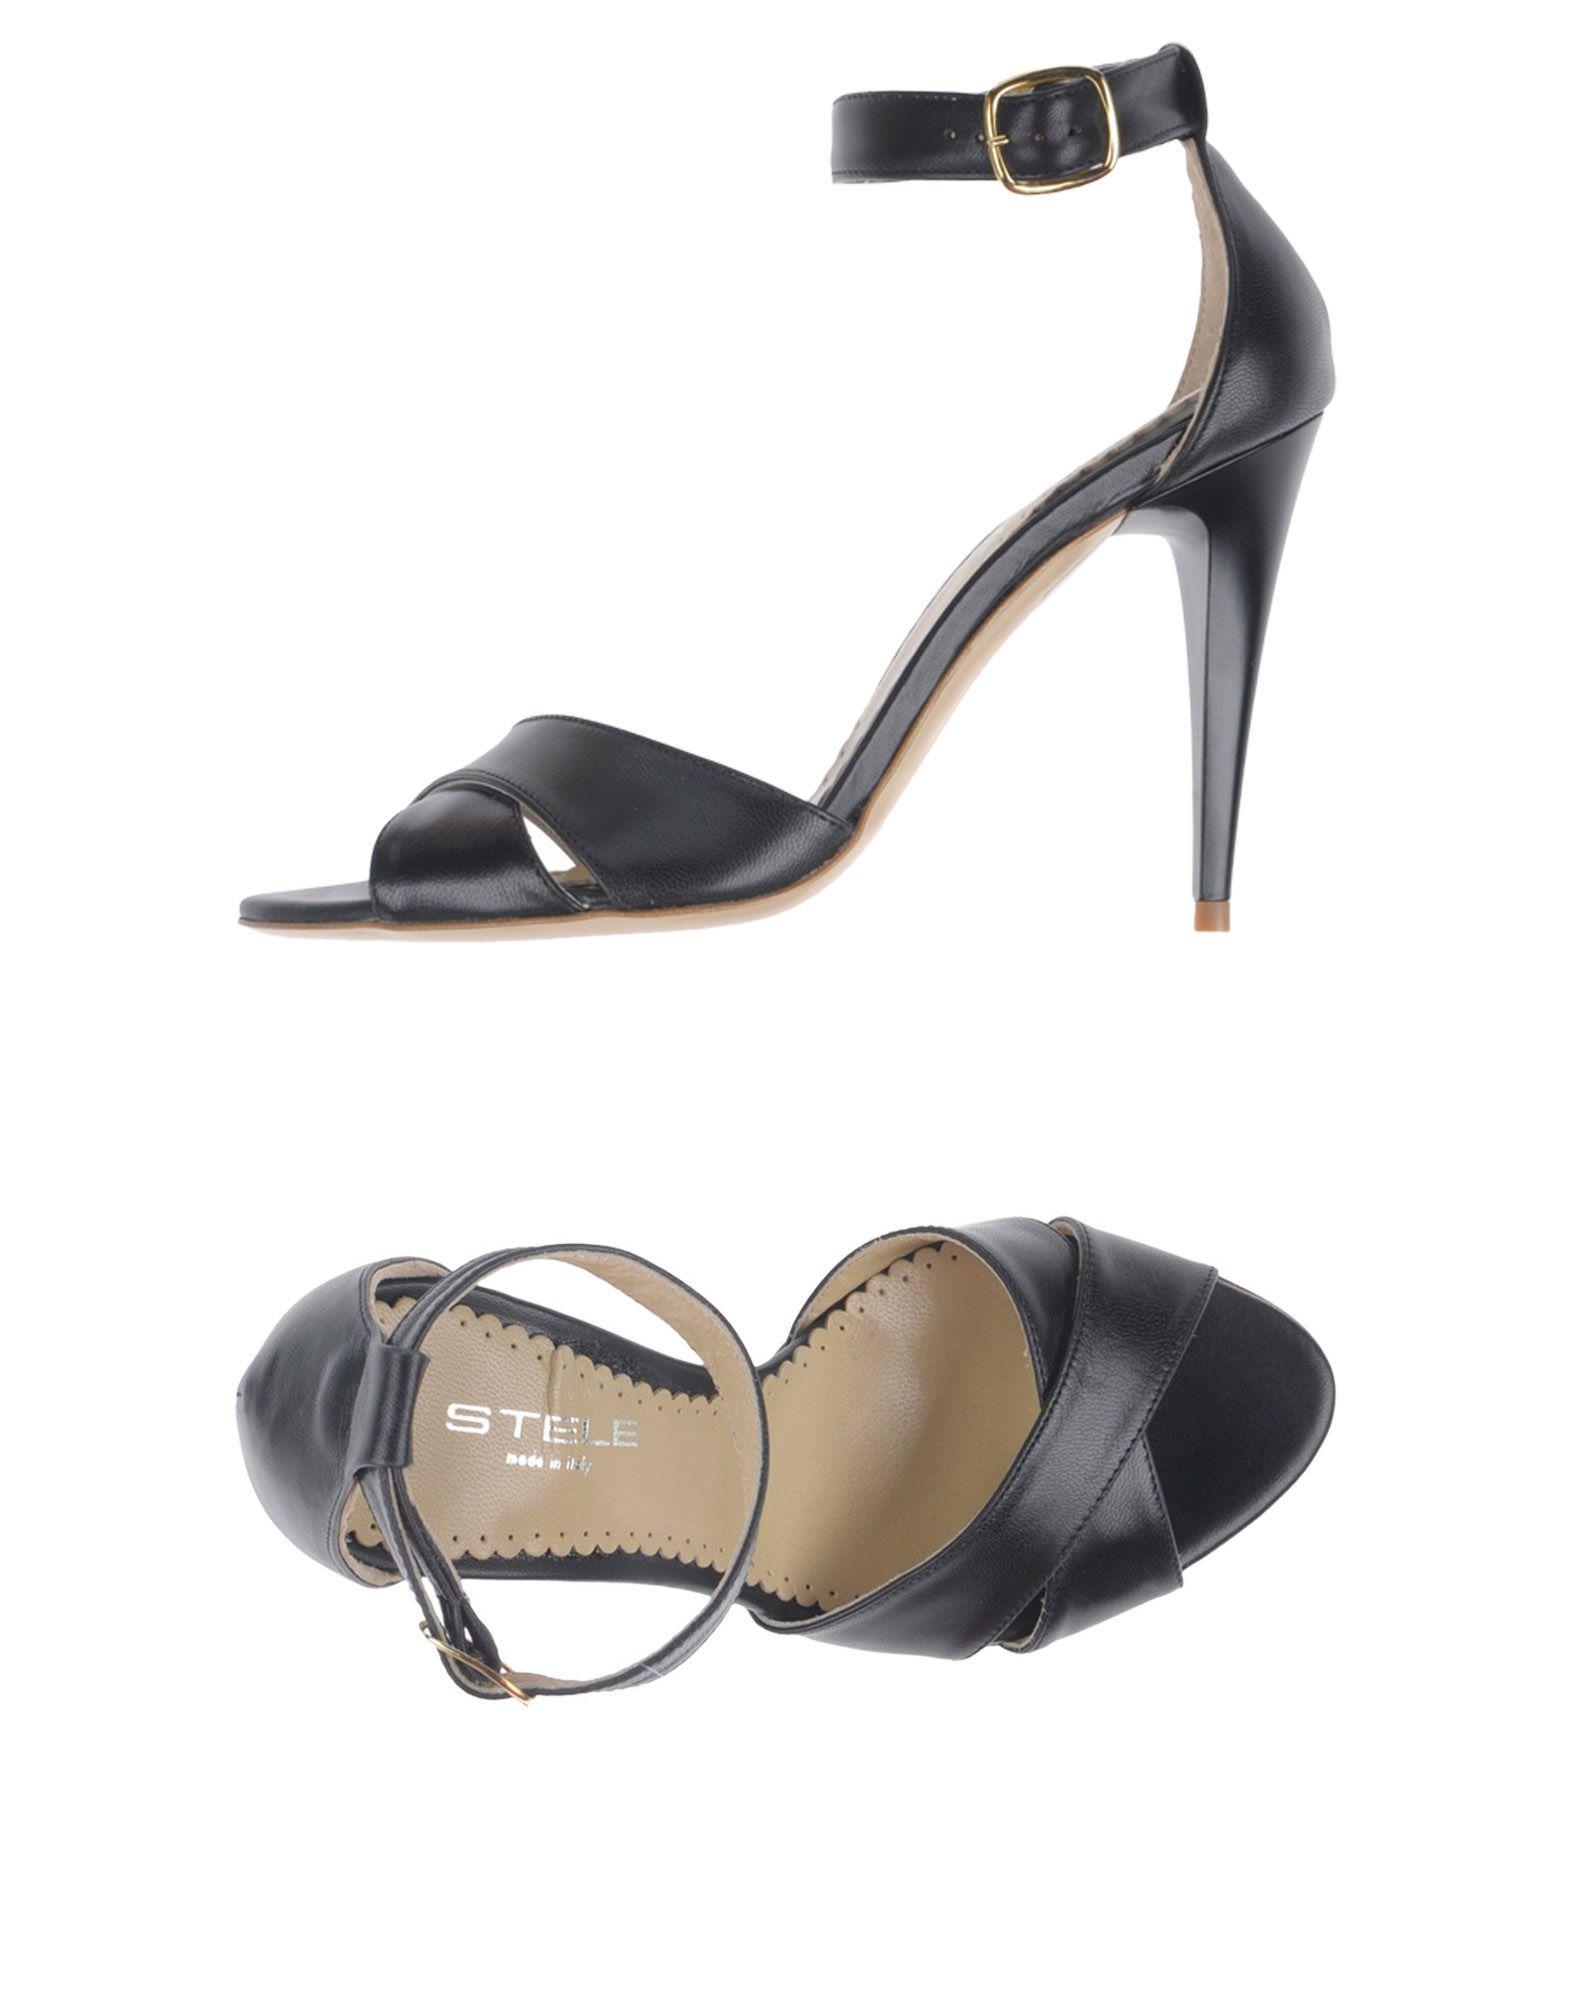 Stele Sandalen Damen  11376130KS Gute Qualität beliebte Schuhe